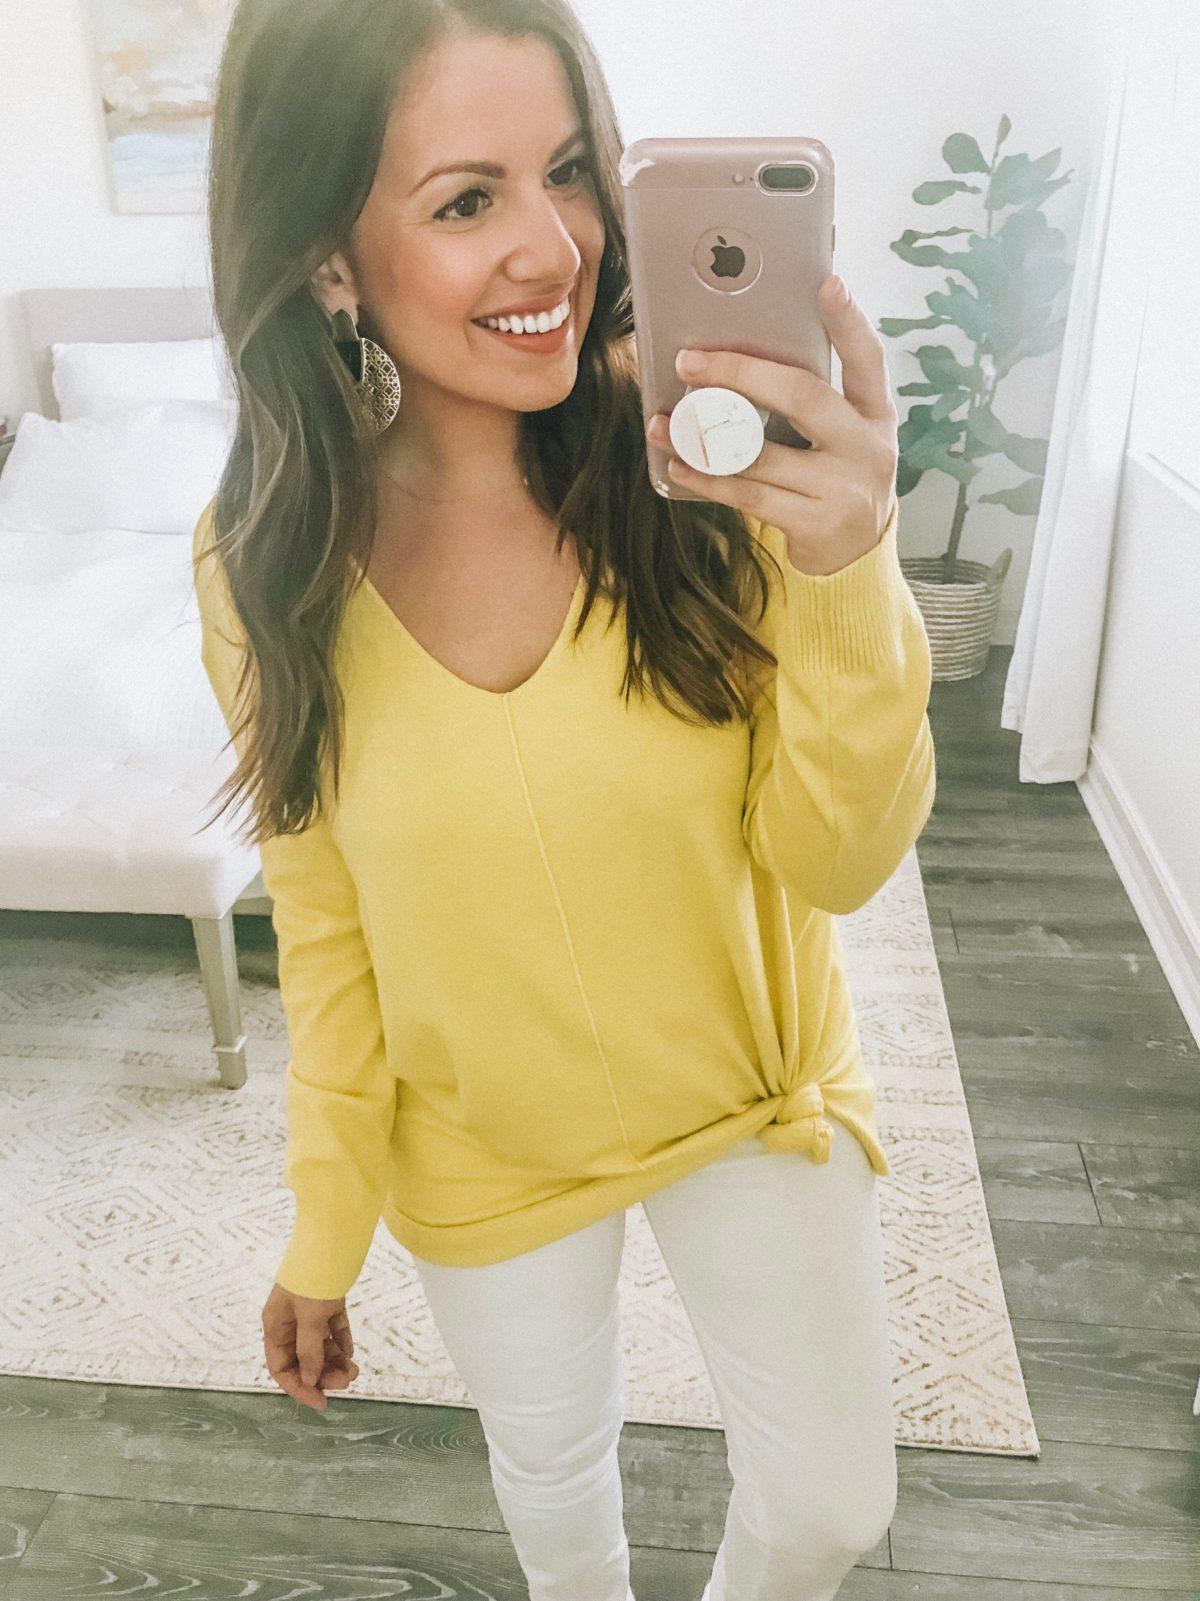 So Soft Cashmere Like Sweater, Neon Yellow Spring Sweater, Spring Sweater, Sunflowers and Stilettos fashion blog, Florida Fashion Blogger Jaime Cittadino